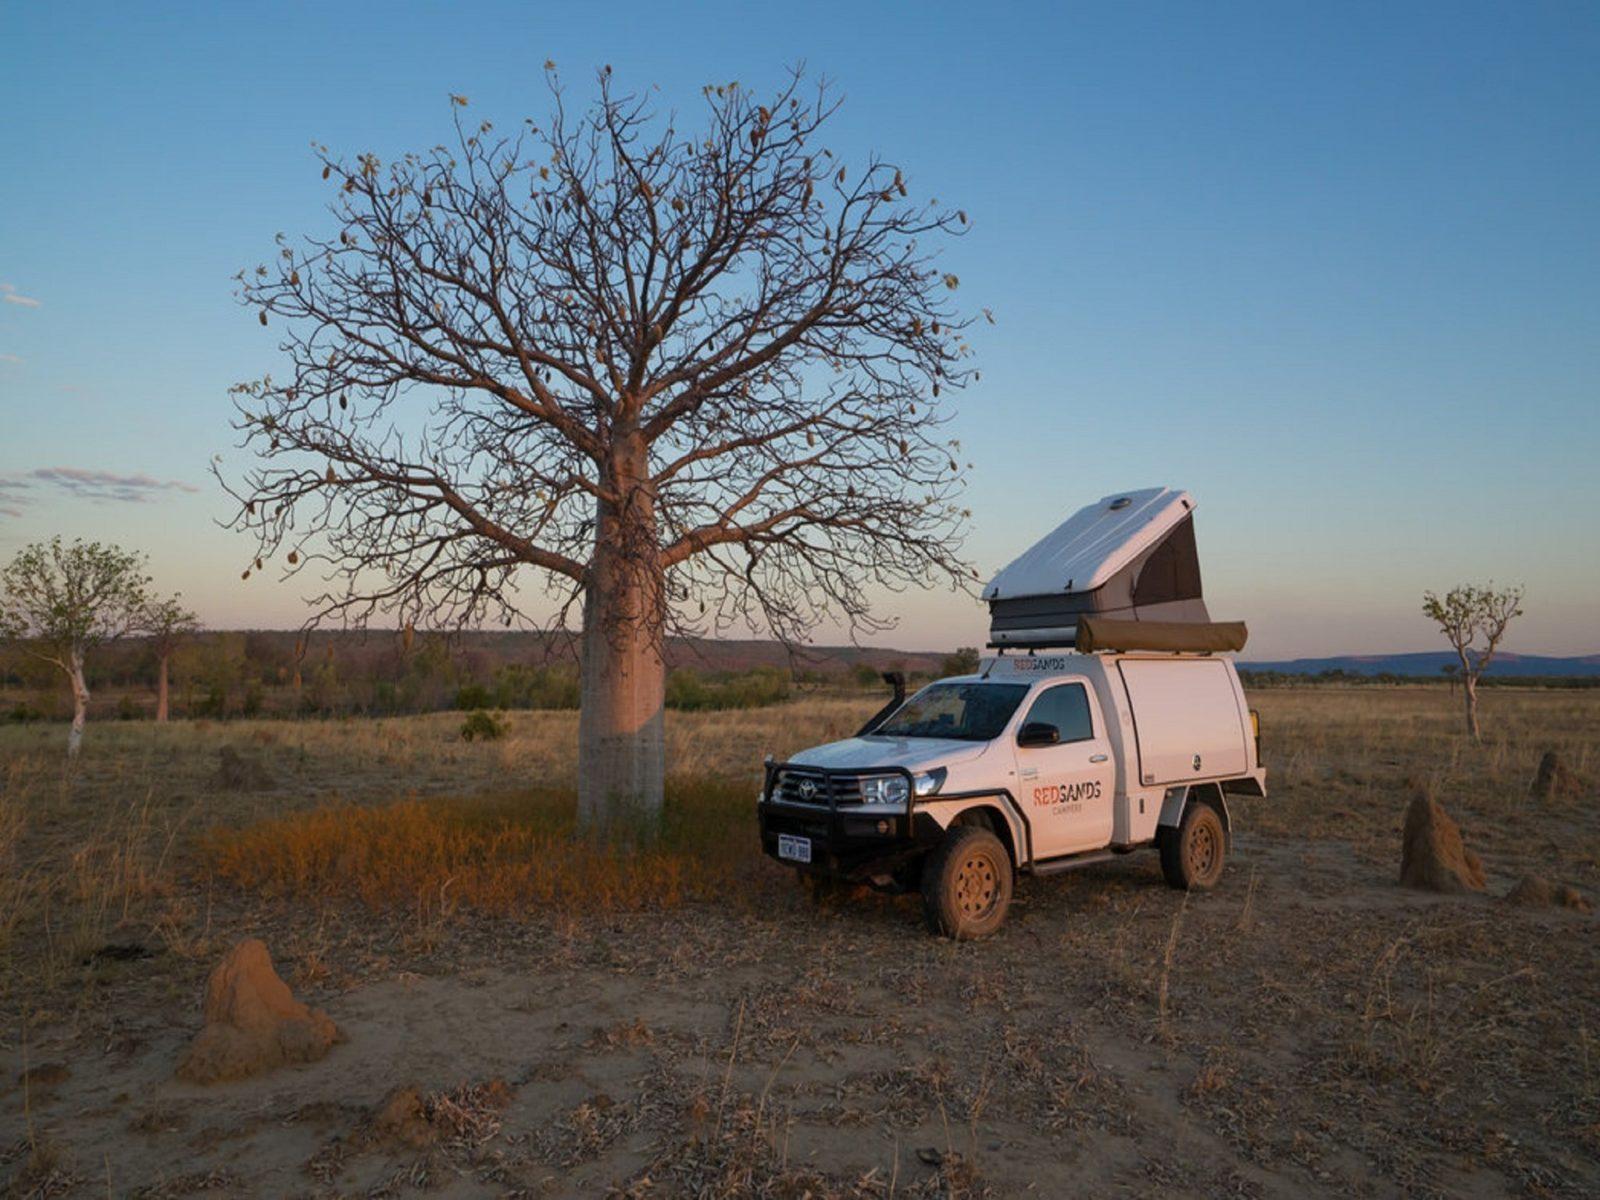 RedSands Campers, Perth, Western Australia